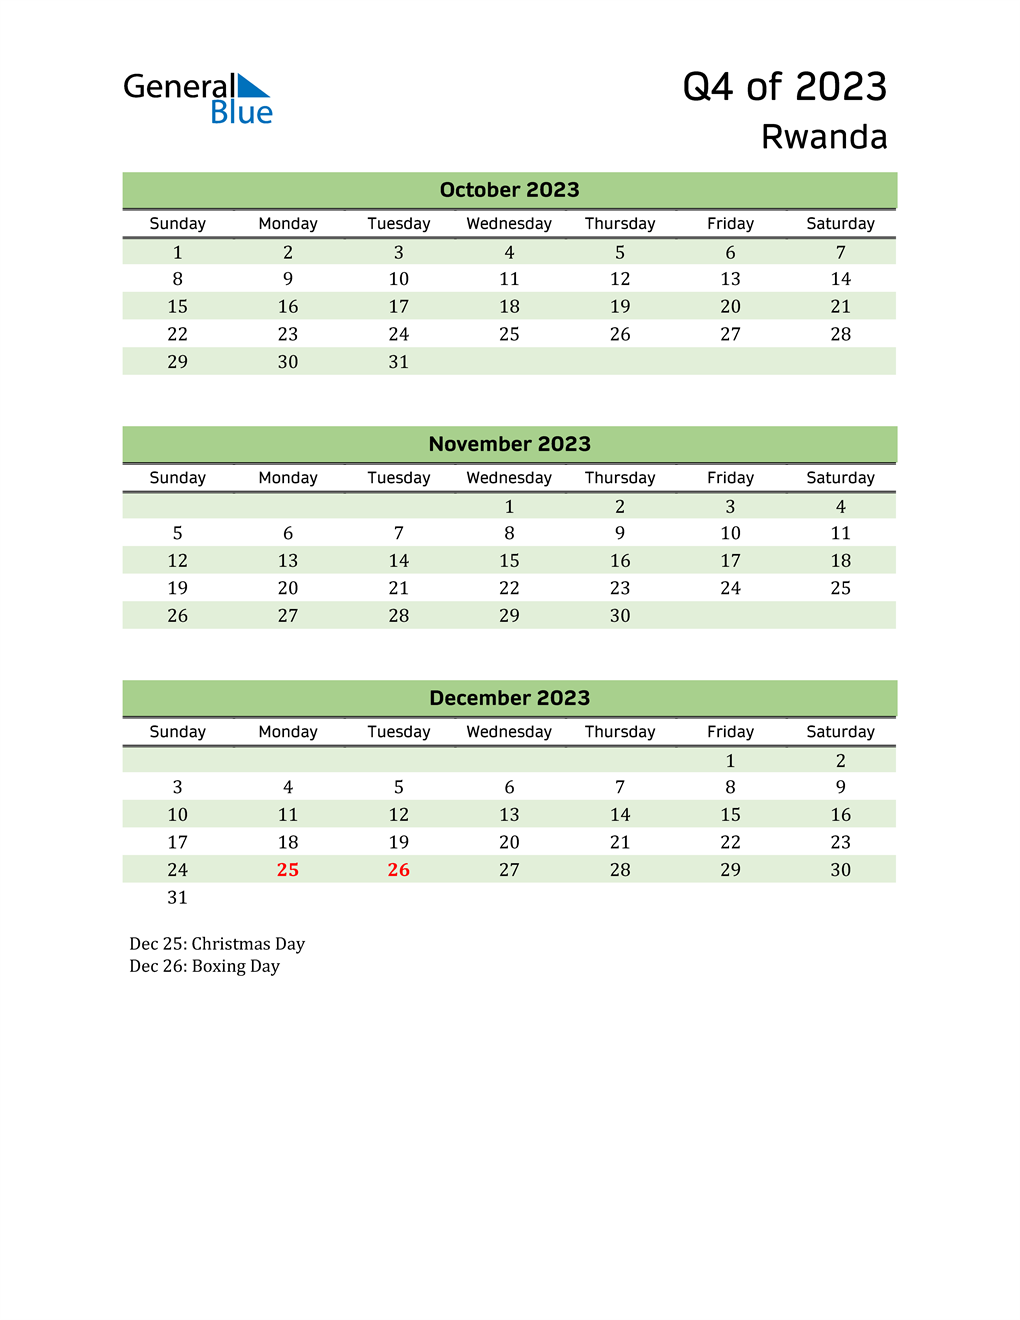 Quarterly Calendar 2023 with Rwanda Holidays